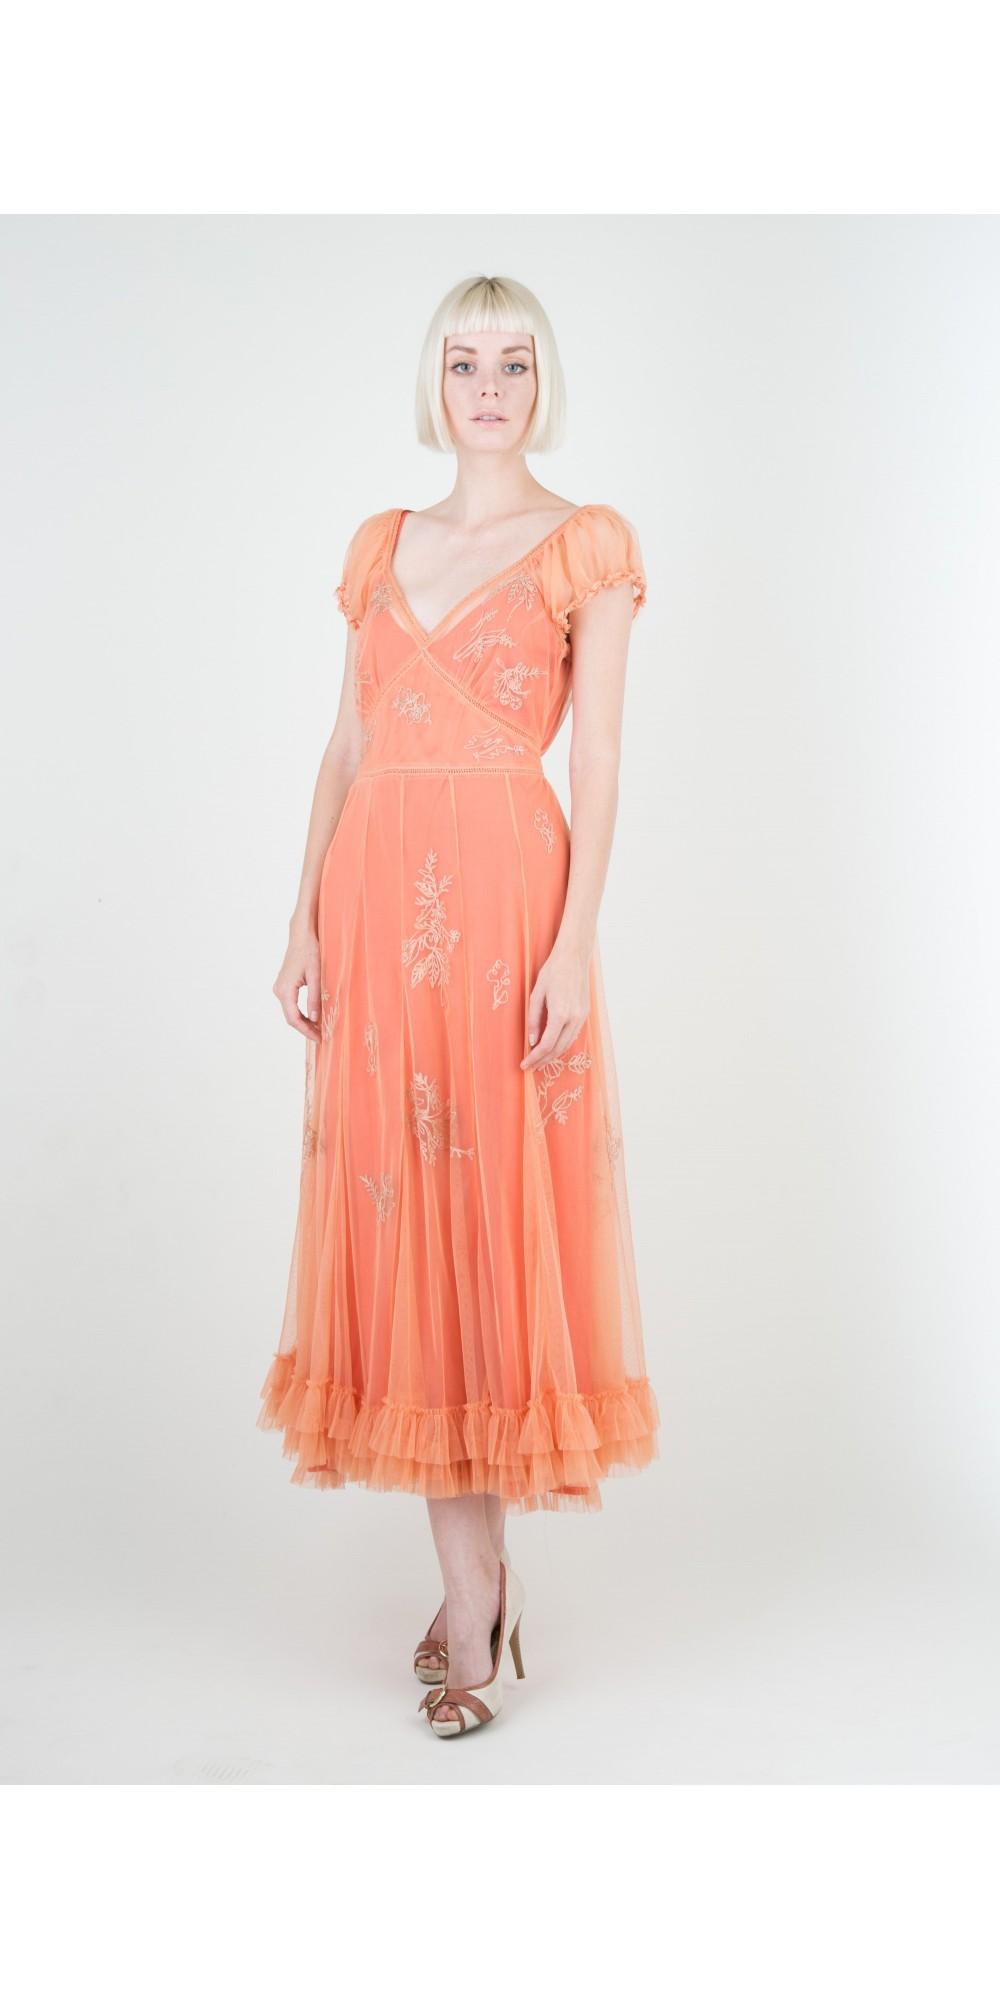 Nataya Ballerina Dress 40193 Buy Nataya Dresses At The Ws